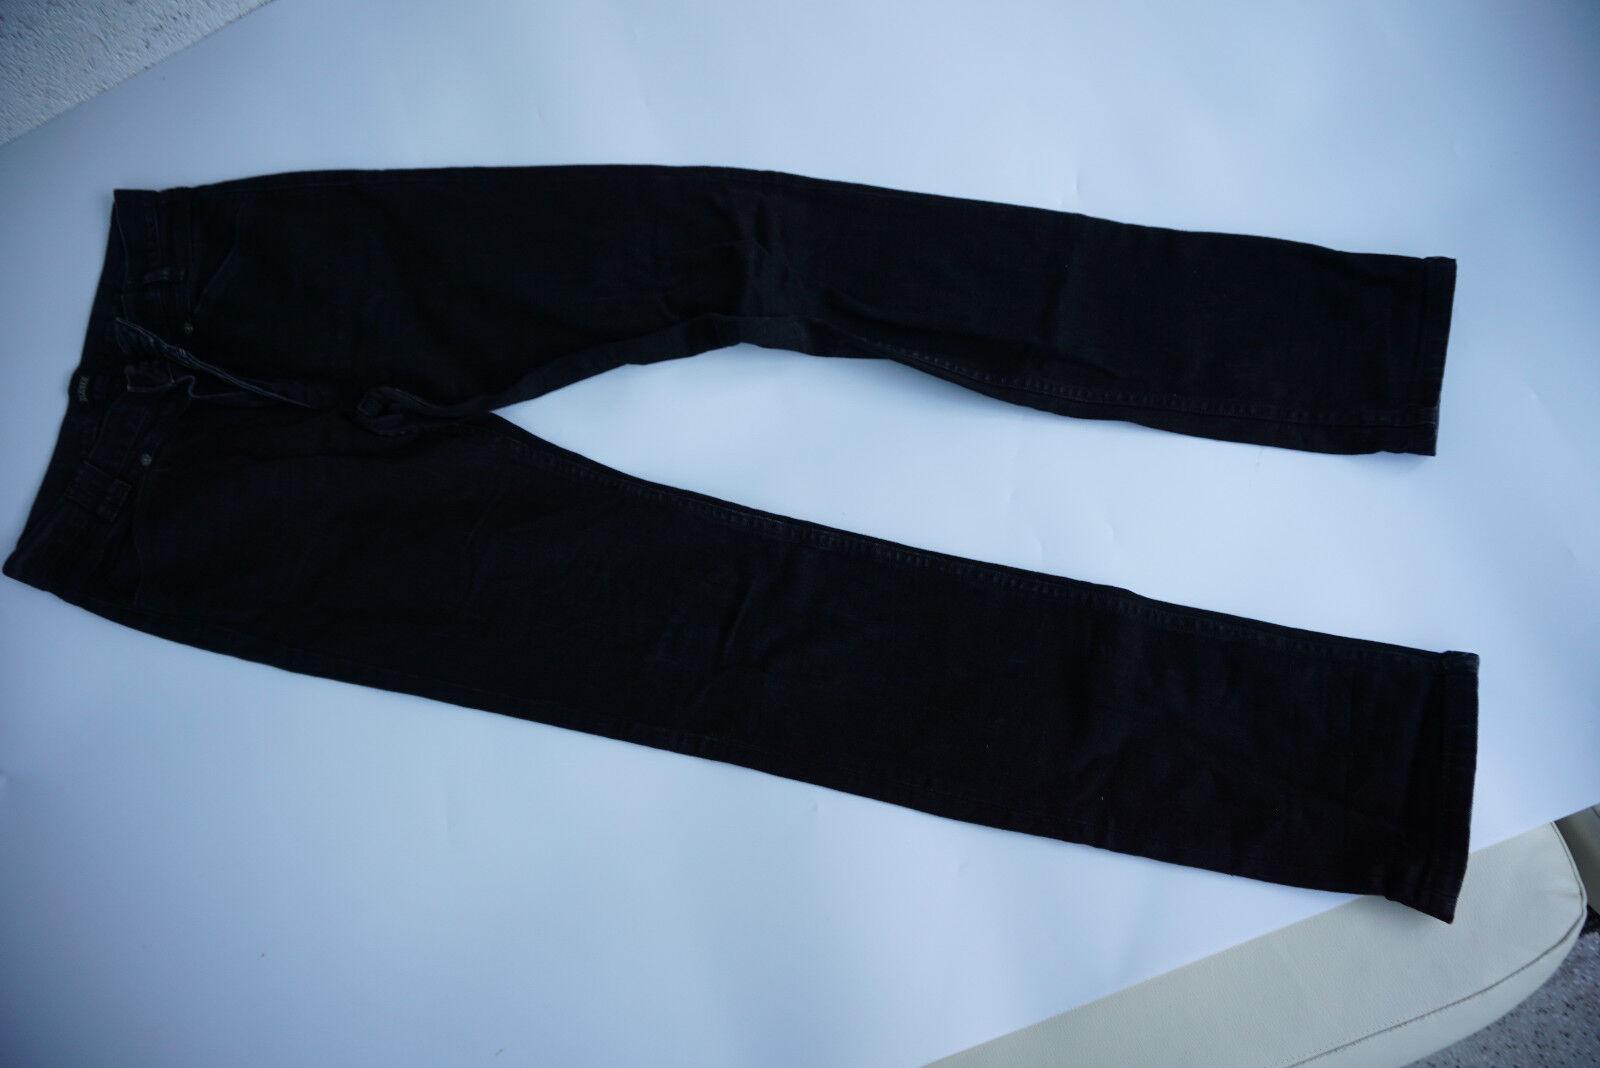 CLOSED Pedal Sky Damen stretch slim Jeans Hose 28/34 W28 L34 schwarz black TOP